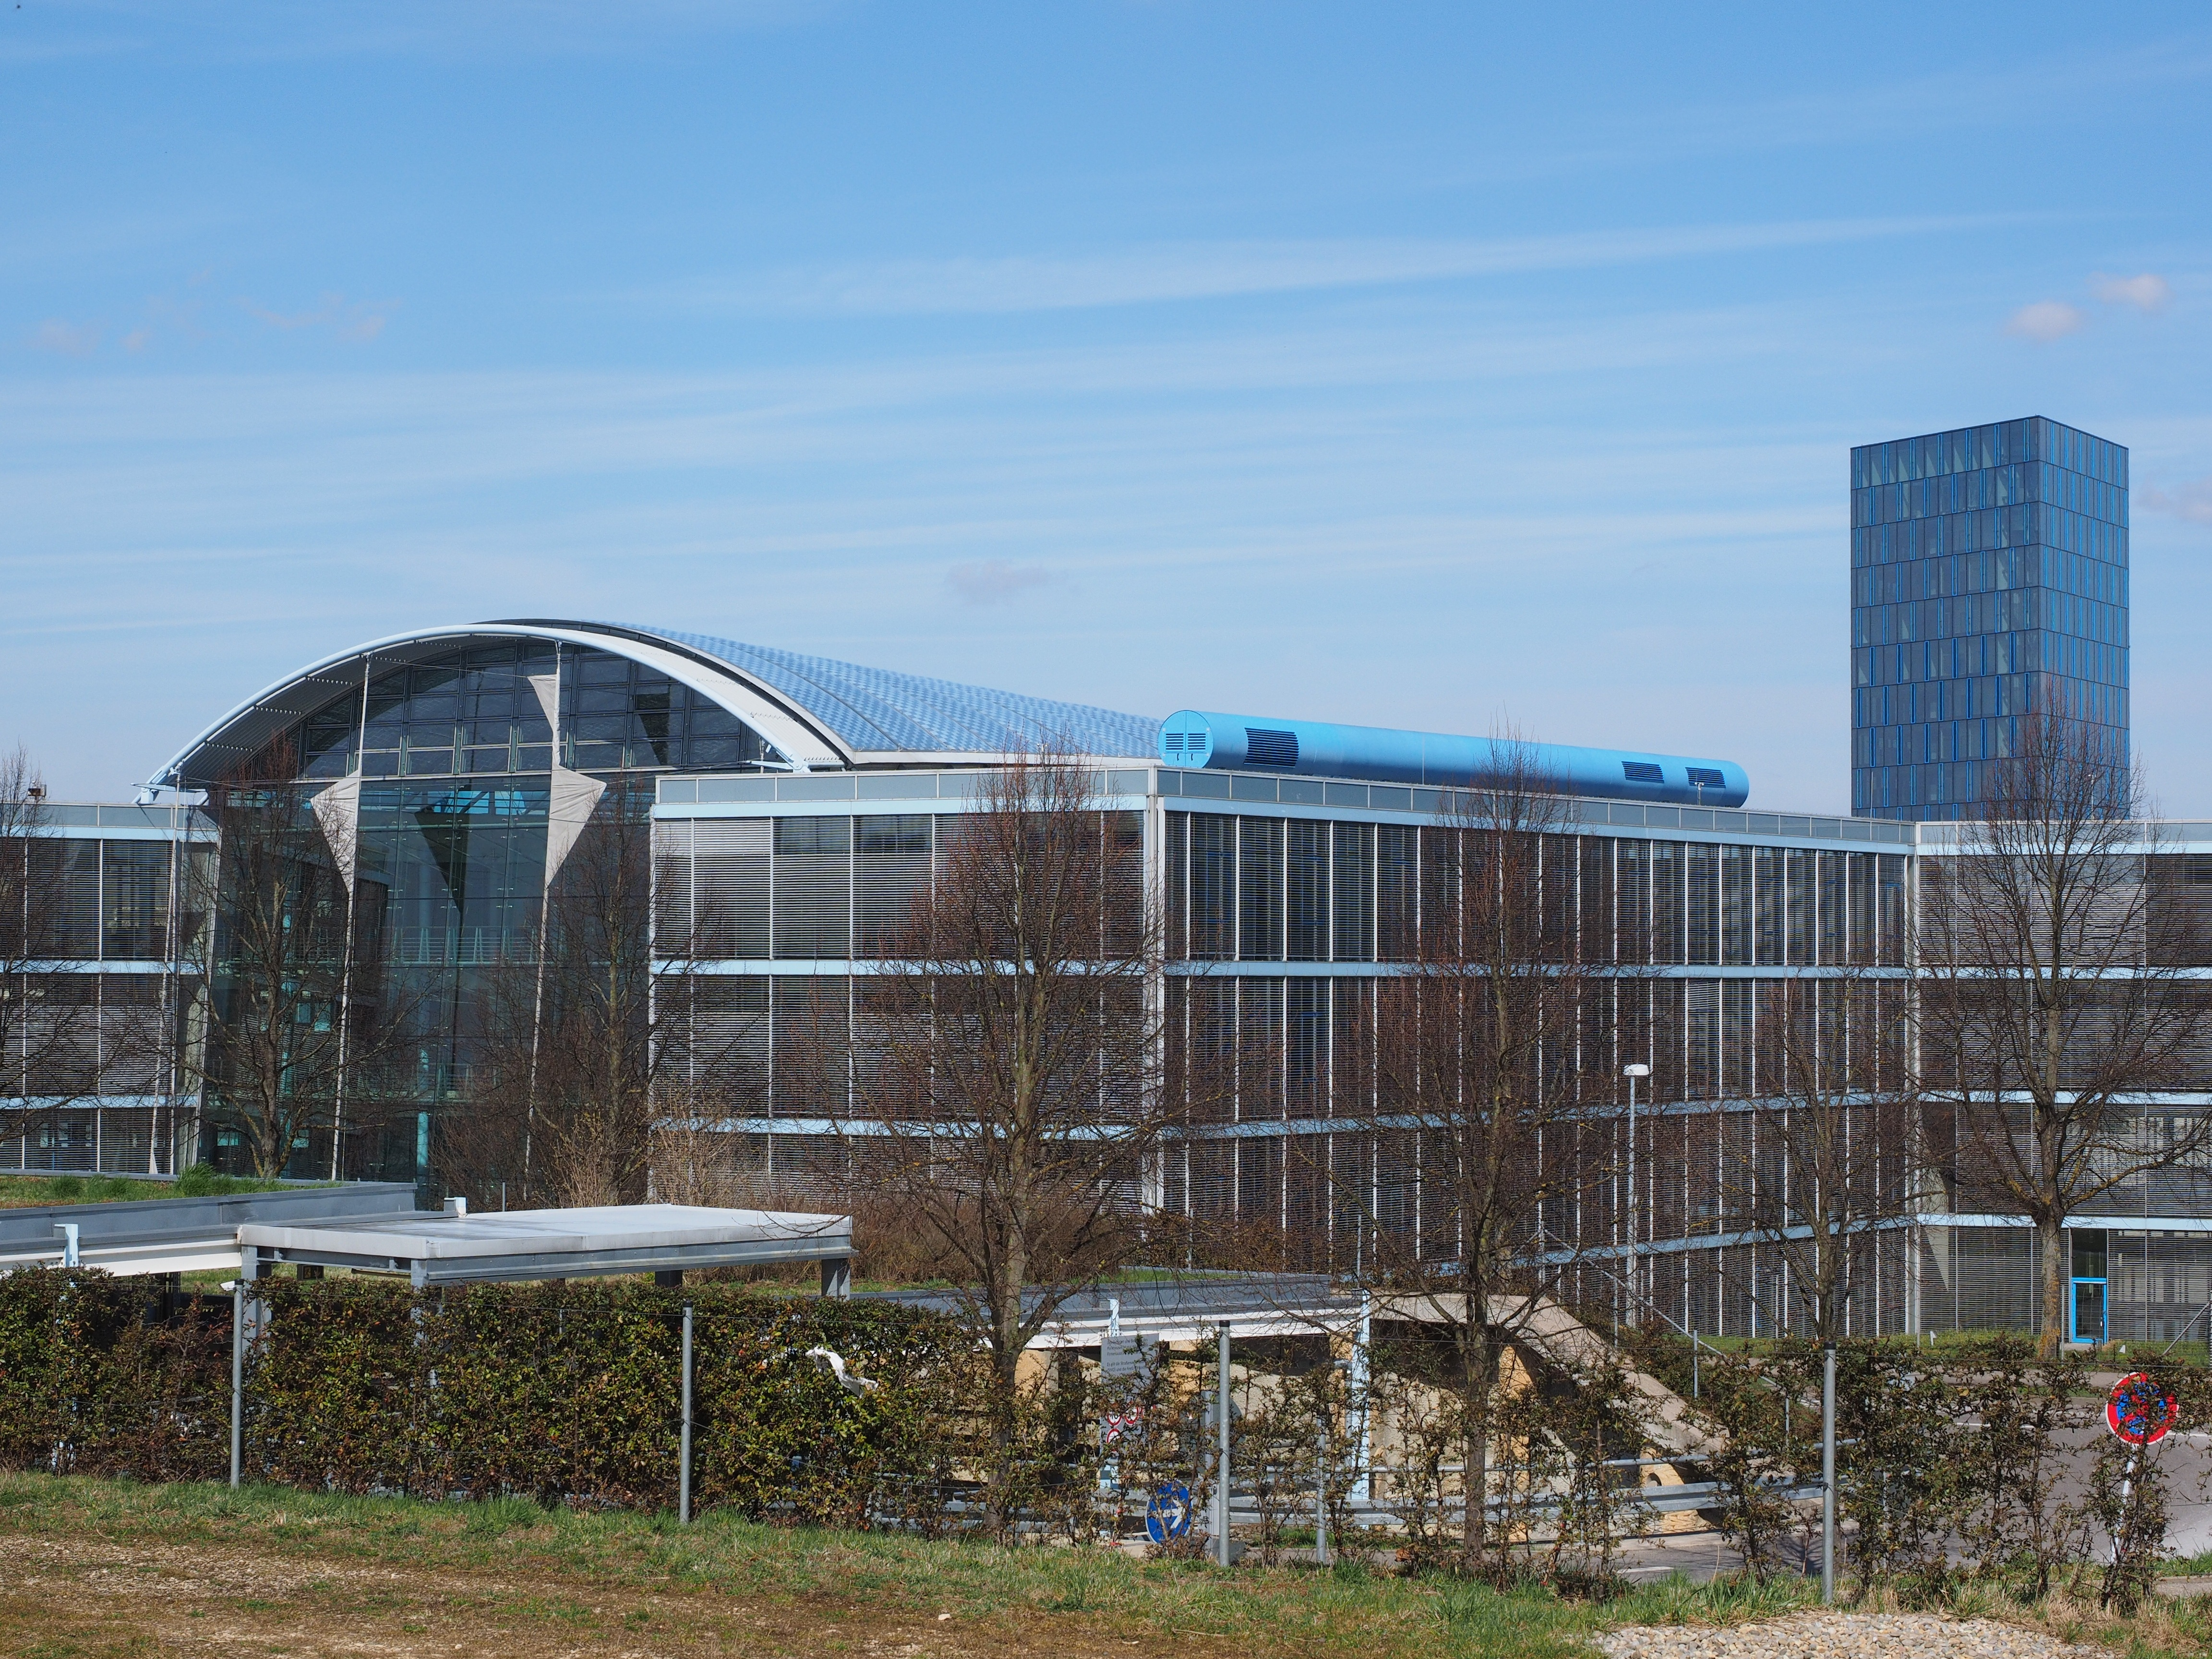 Free stock photo of city, sky, buildings, building